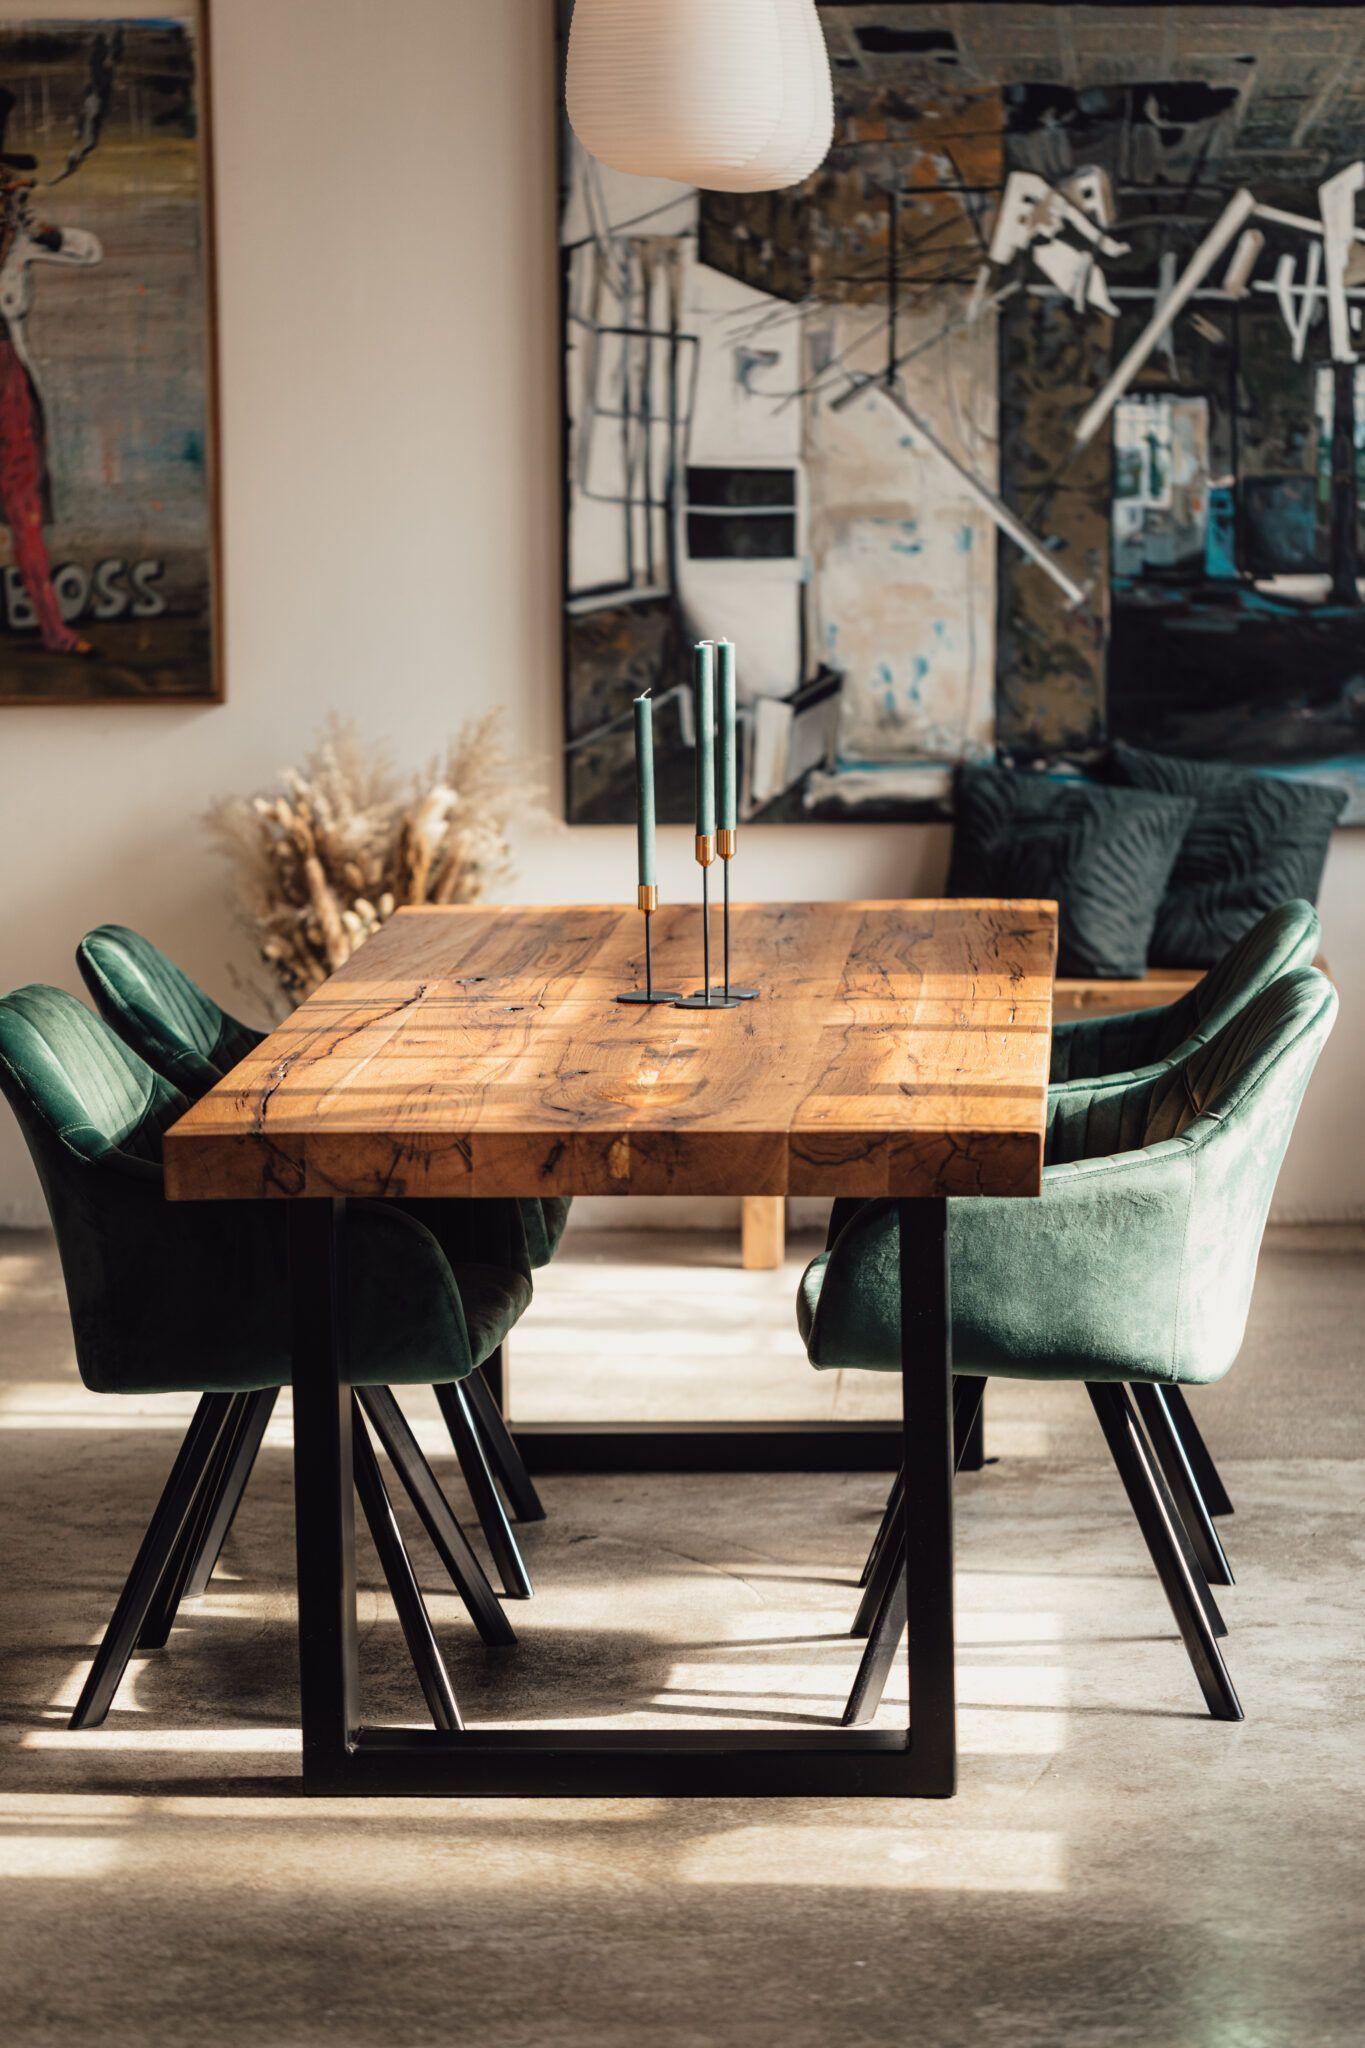 Tisch Zeus - Altholz – Tische & Möbel – Unikate nach Maß | dk MOEBELSCHMIEDE